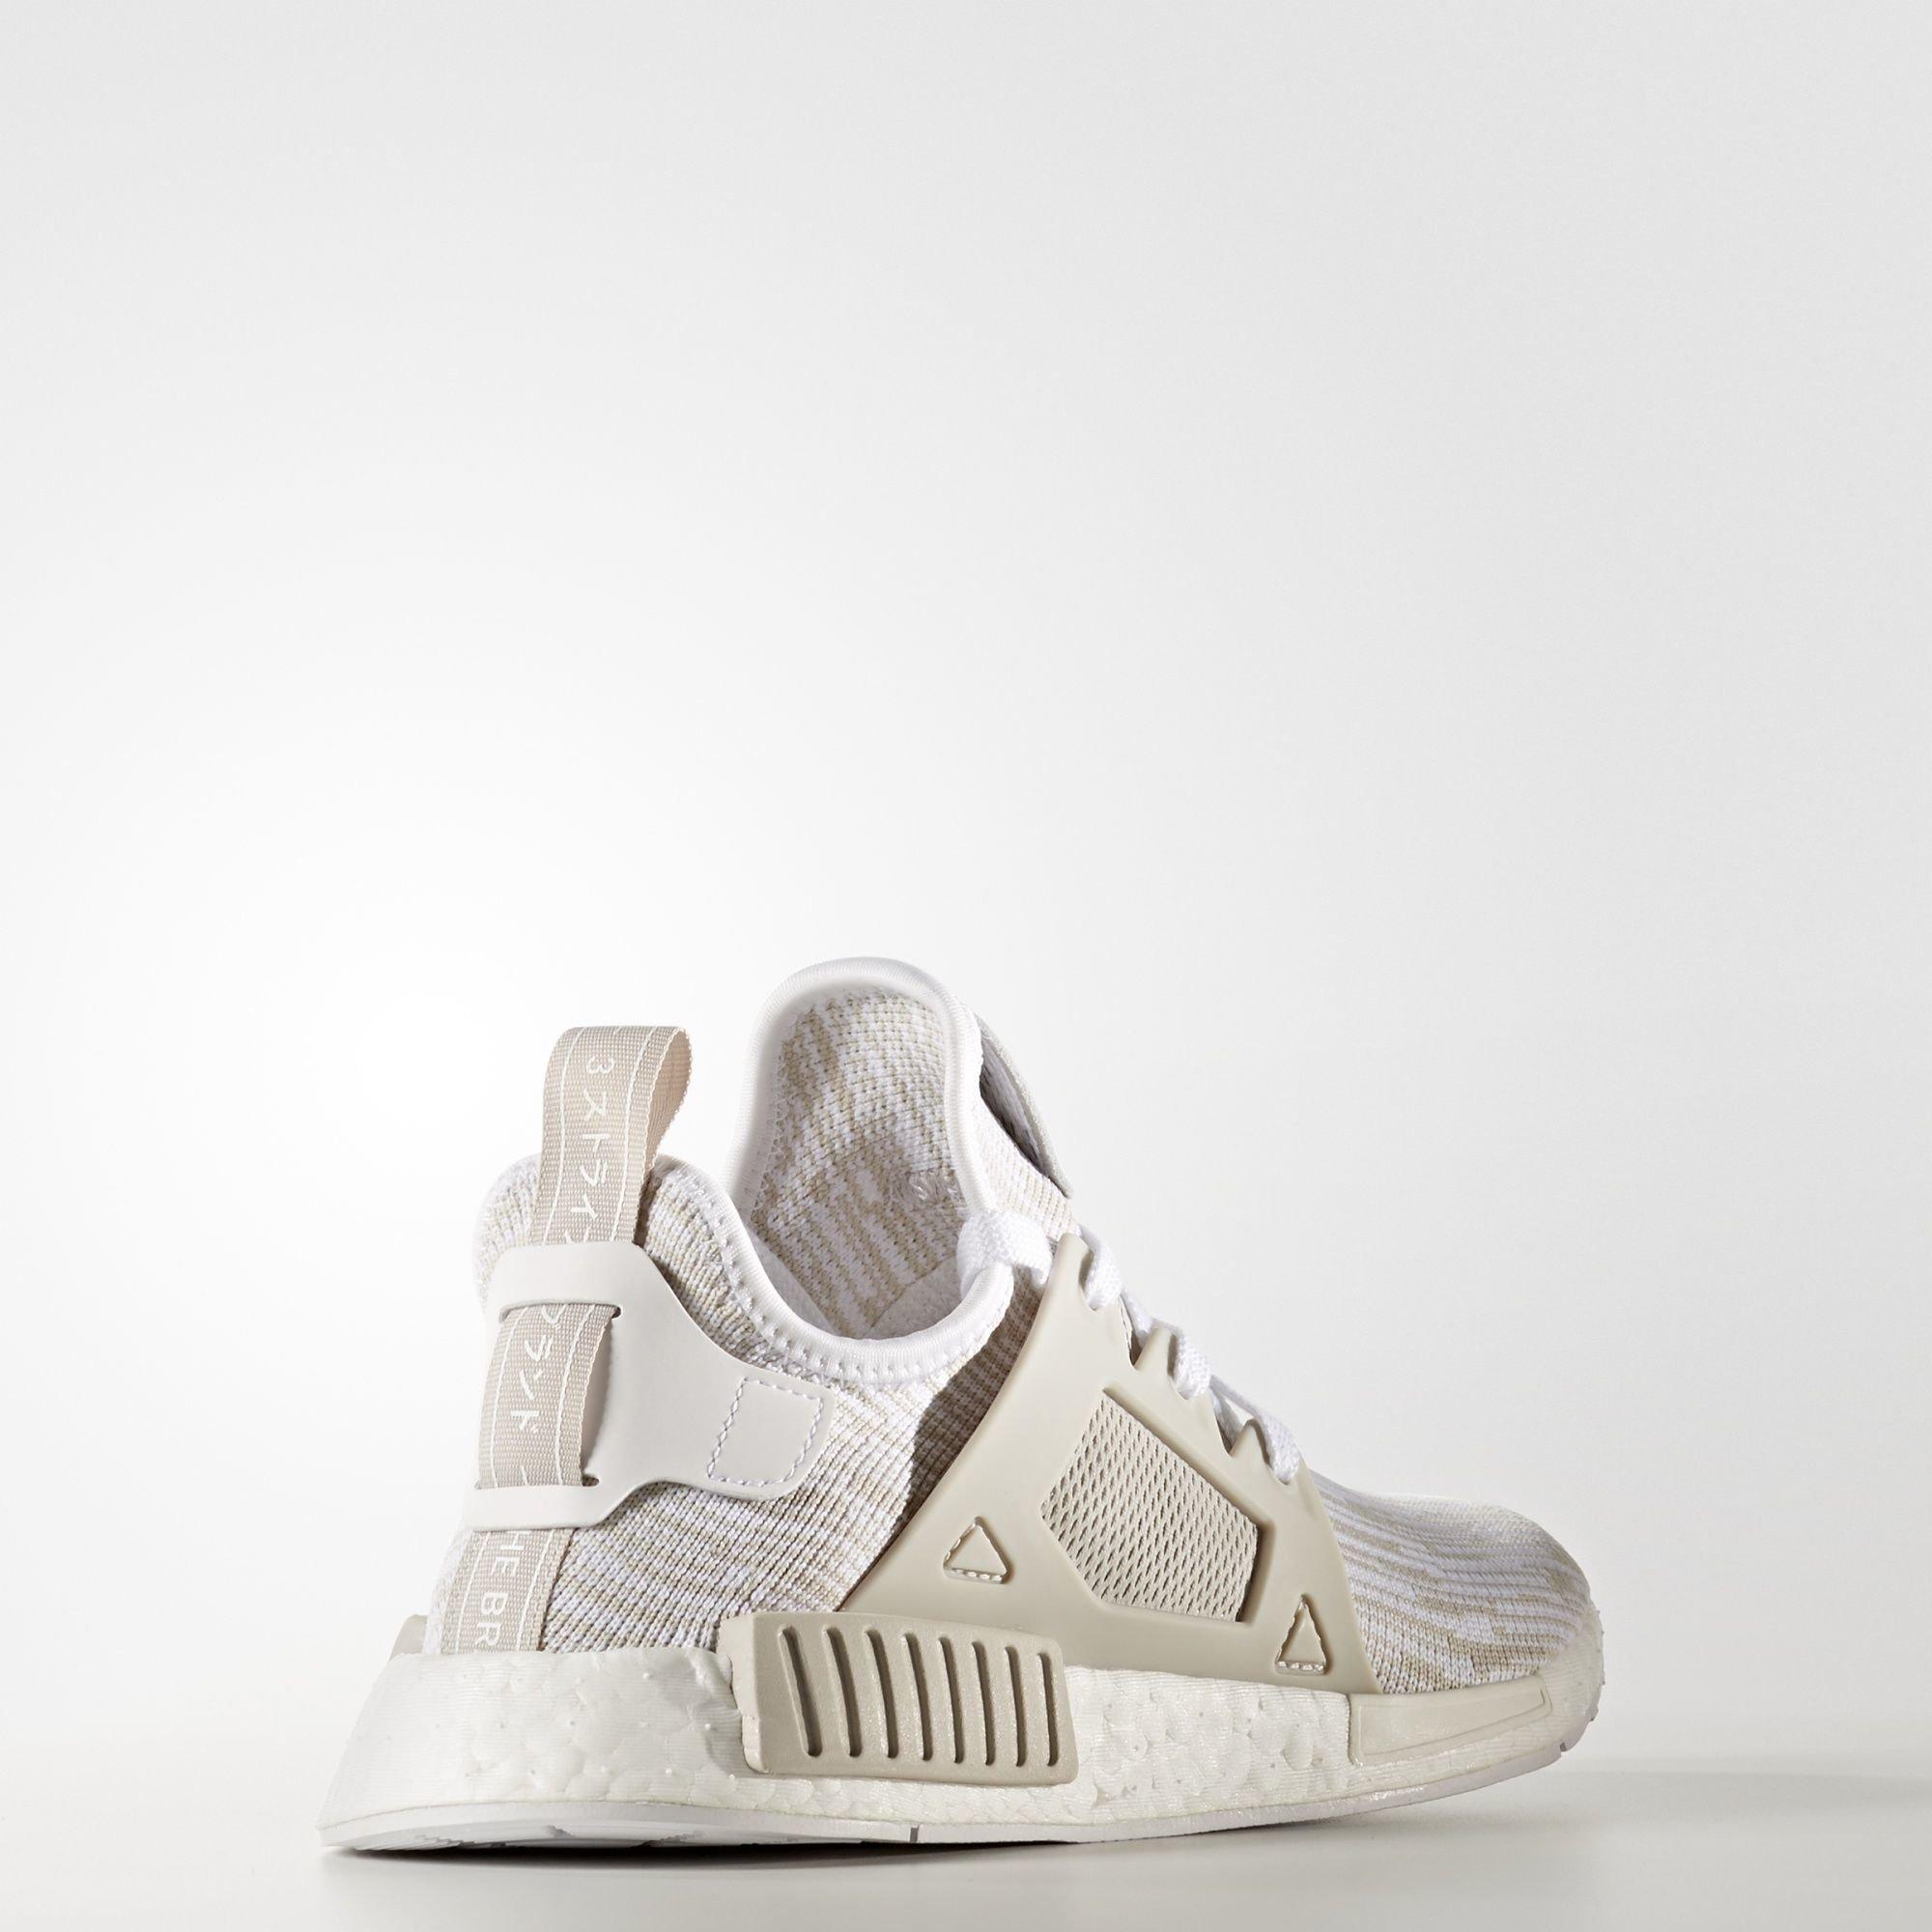 adidas NMD XR1 Primeknit Grey White (BB2369)